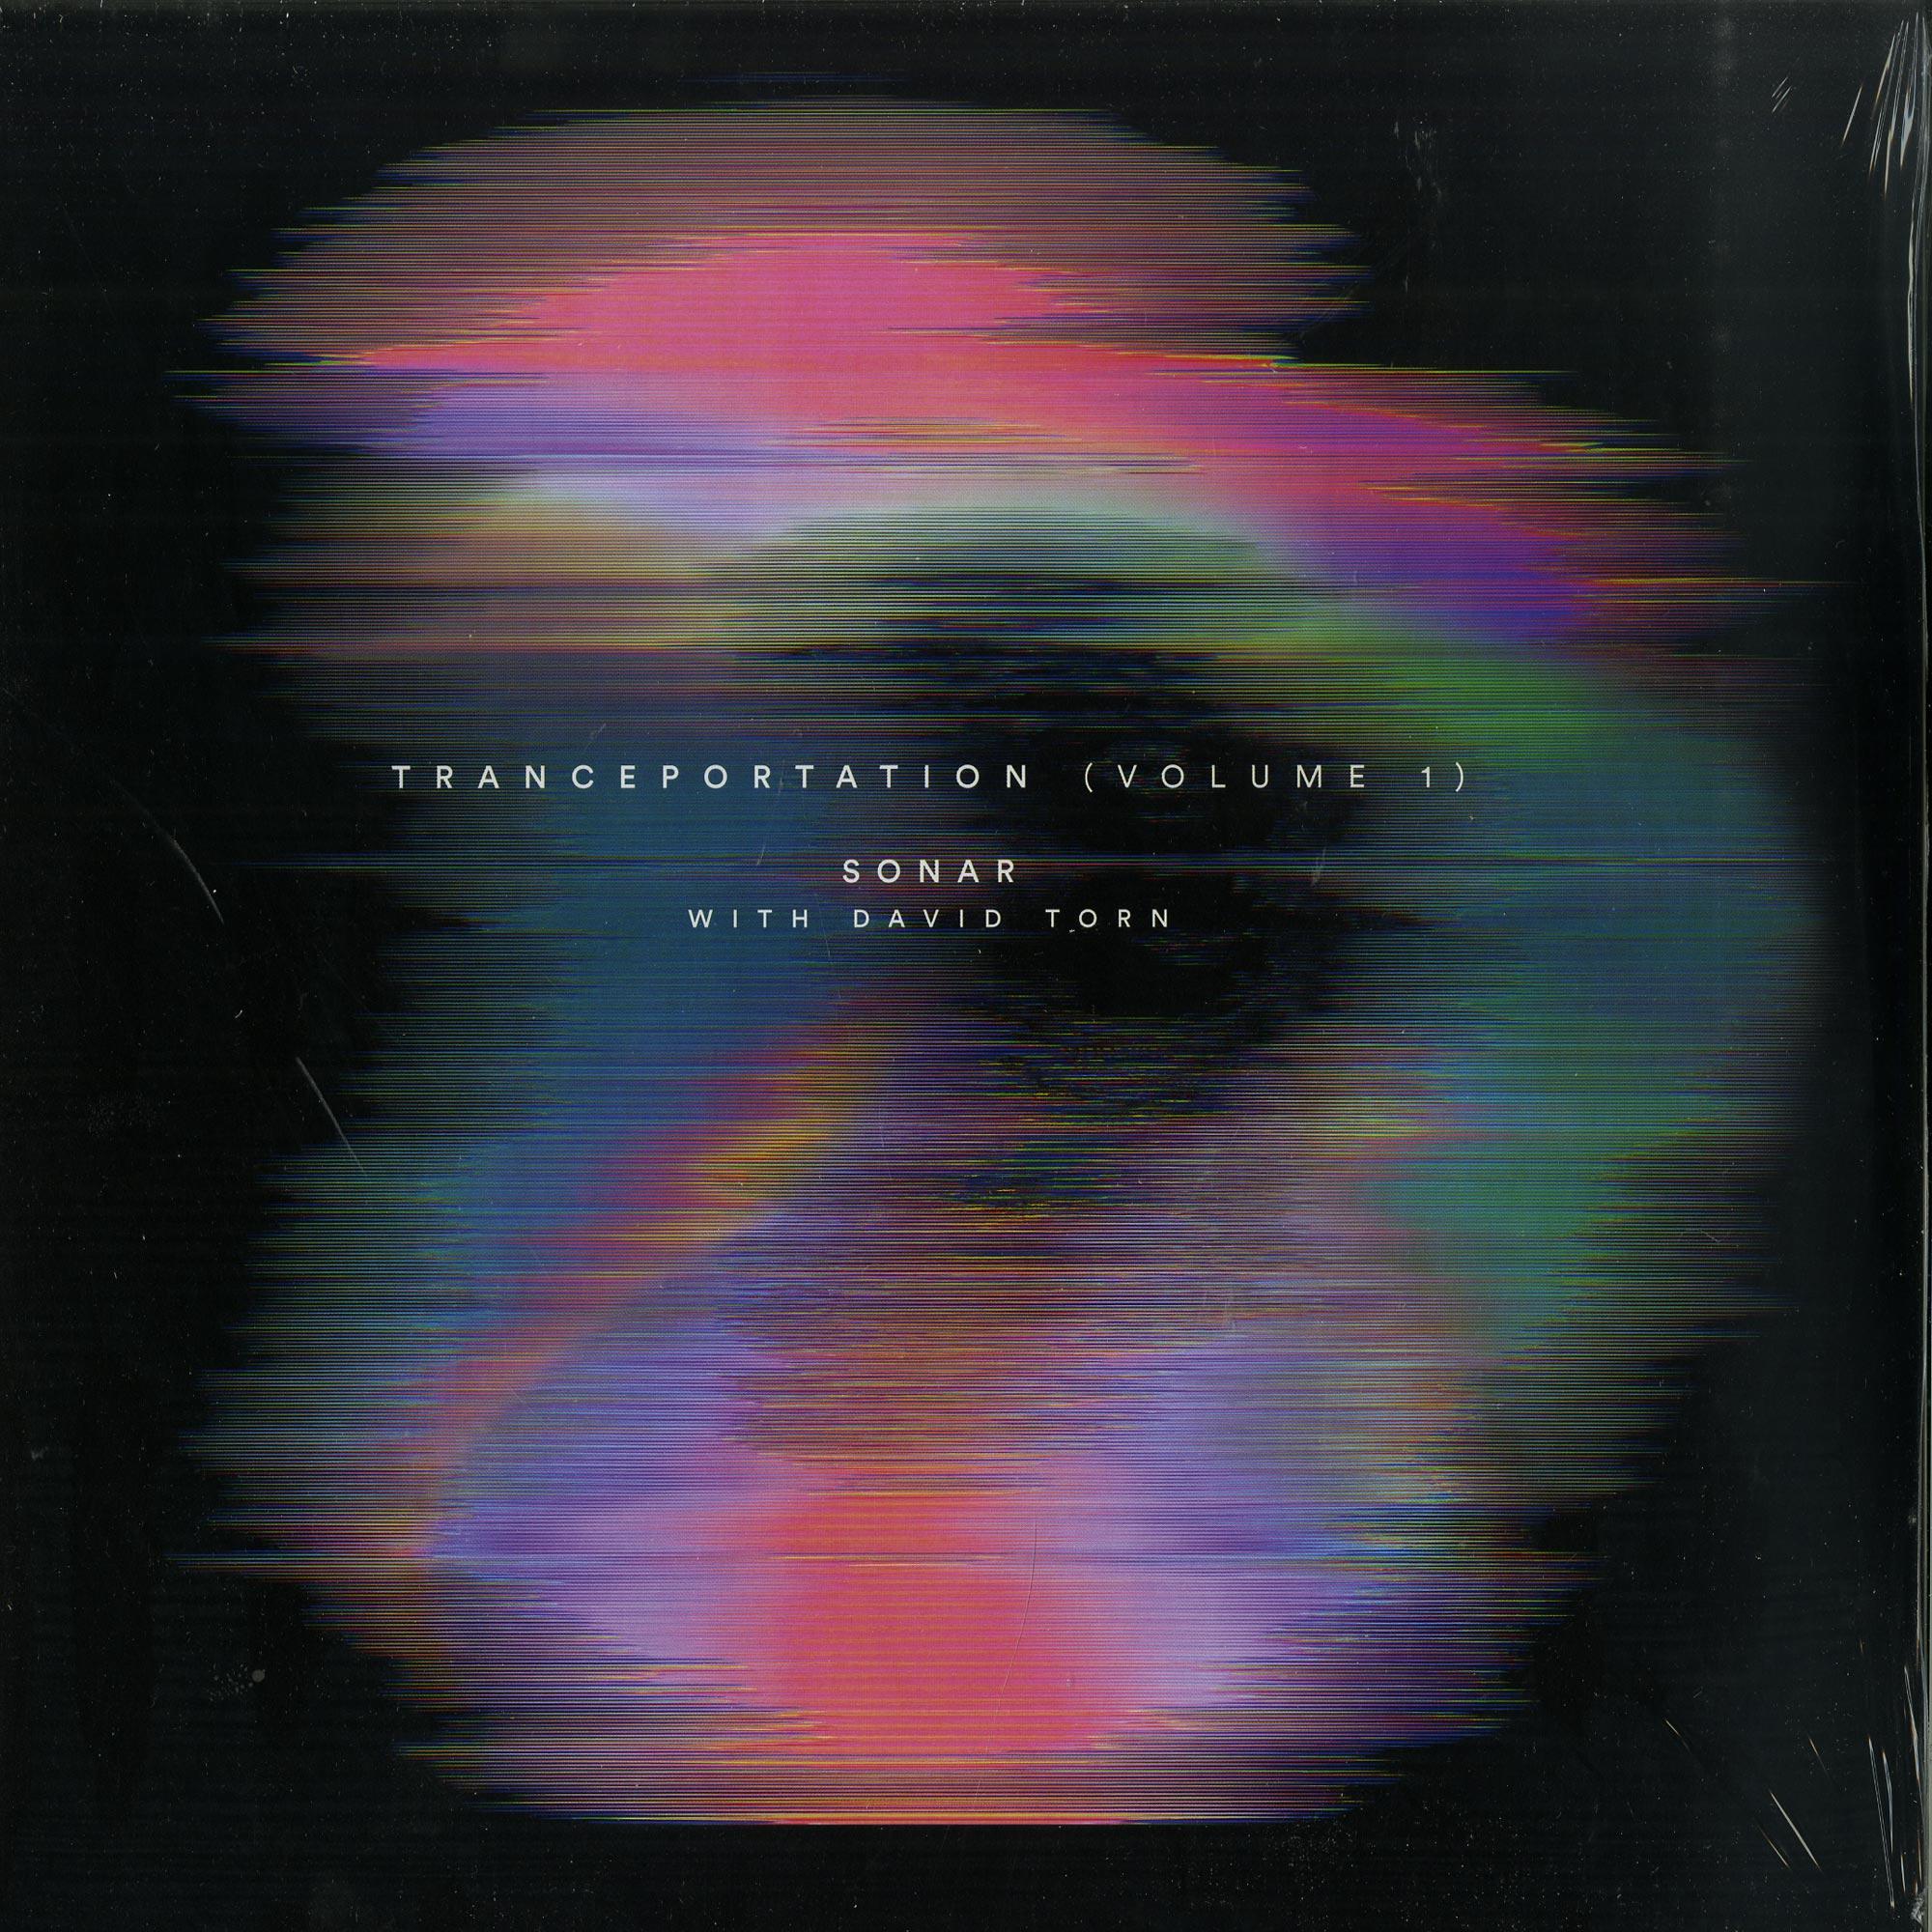 Sonar & David Torn - TRANCEPORTATION VOL. 1